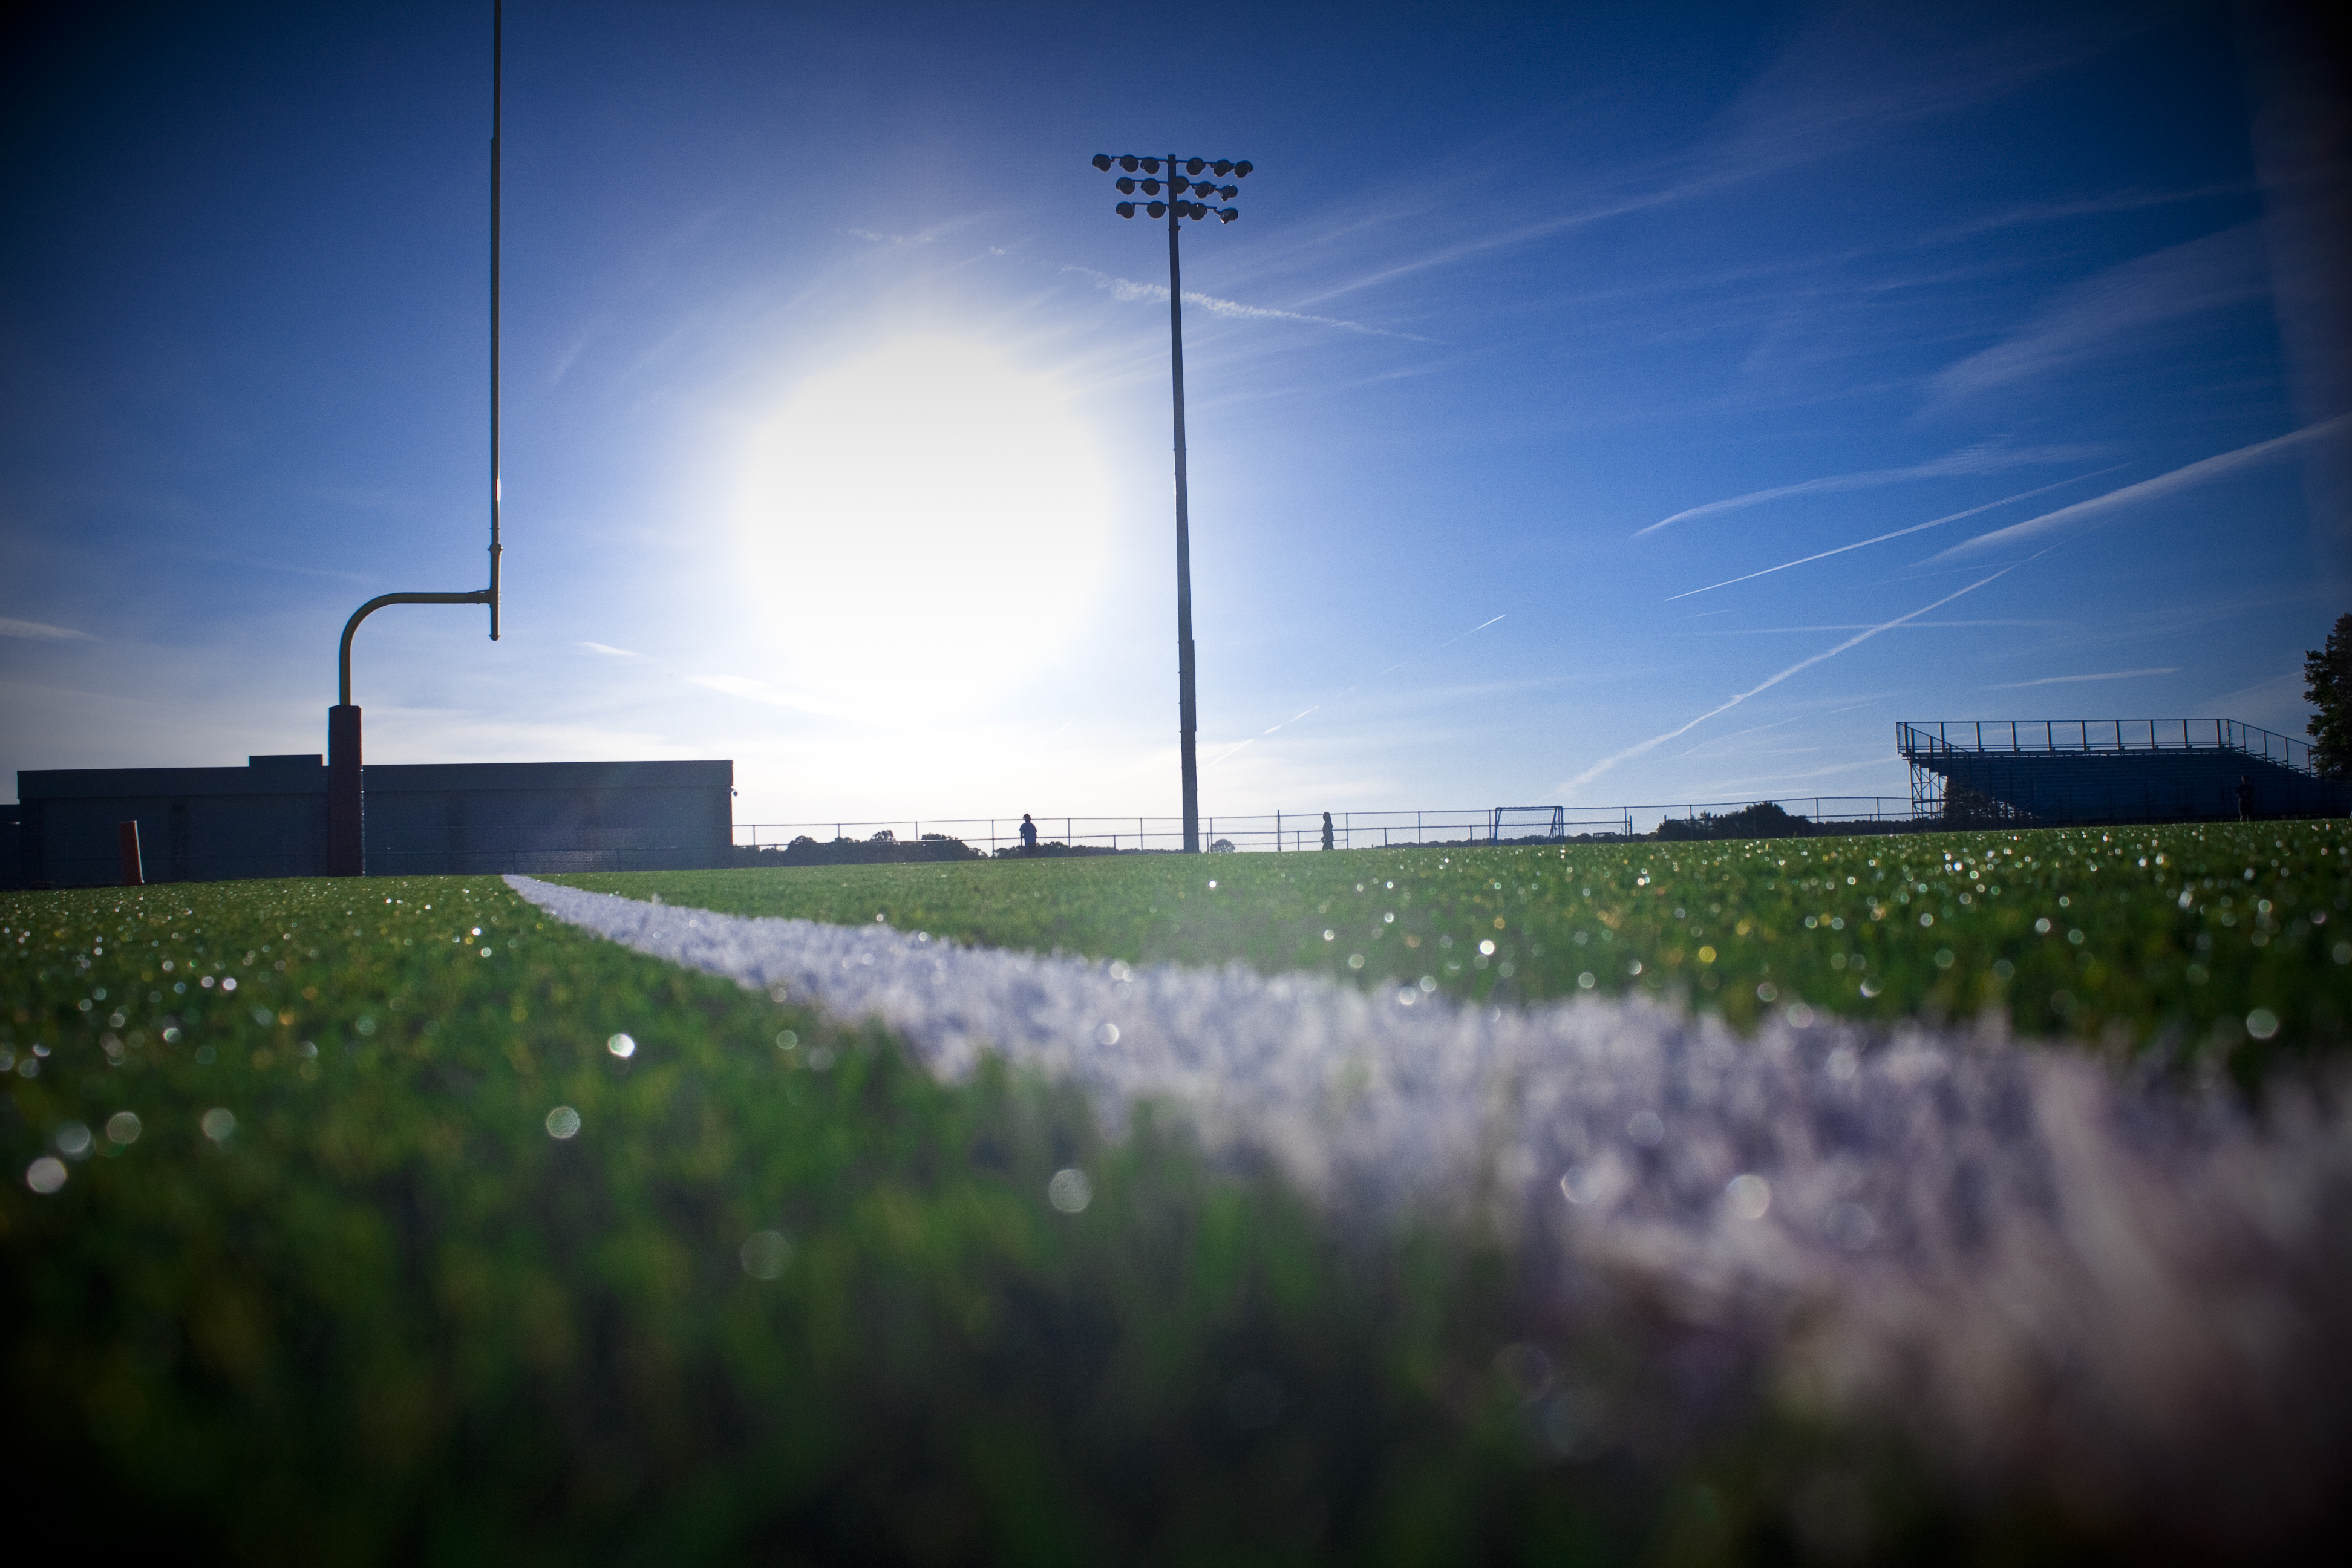 High school football field photography